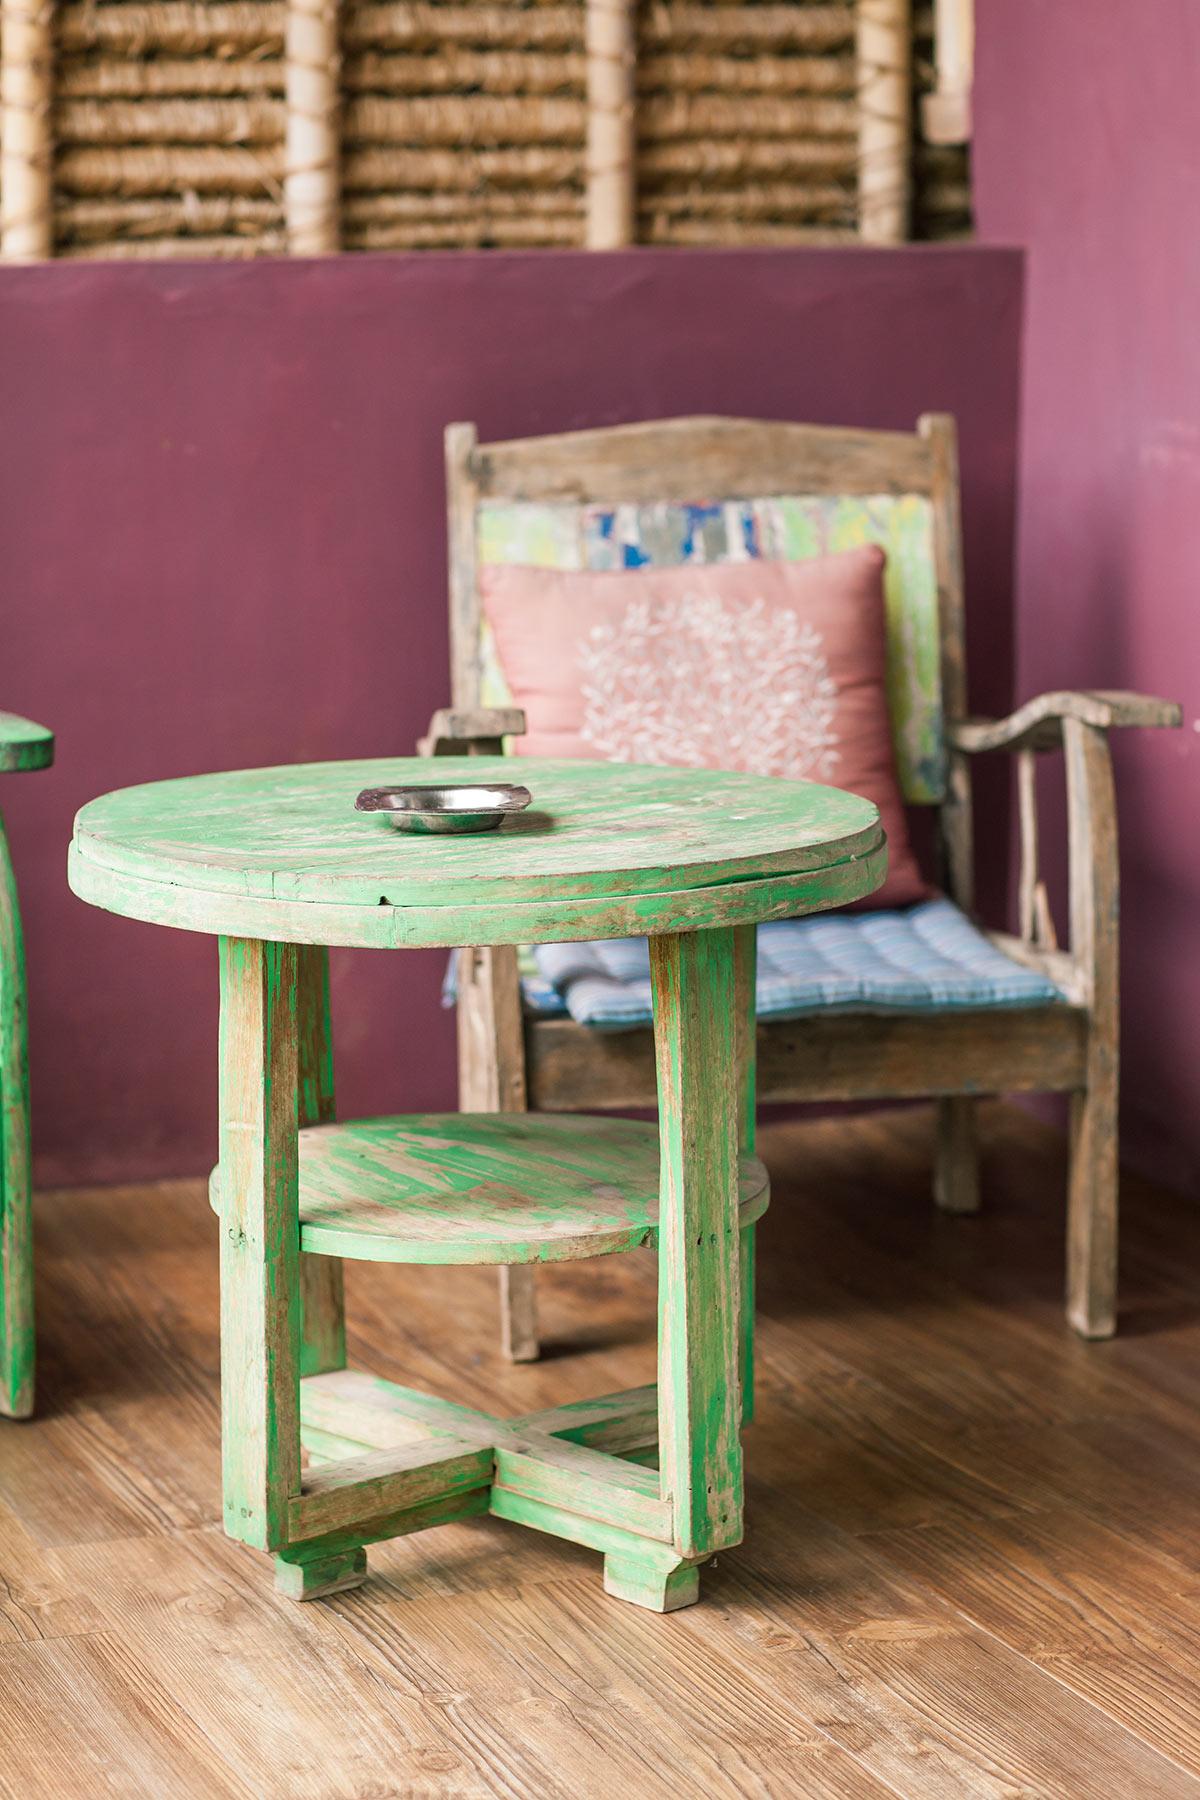 Tavolino in legno pittato in verde vintage.